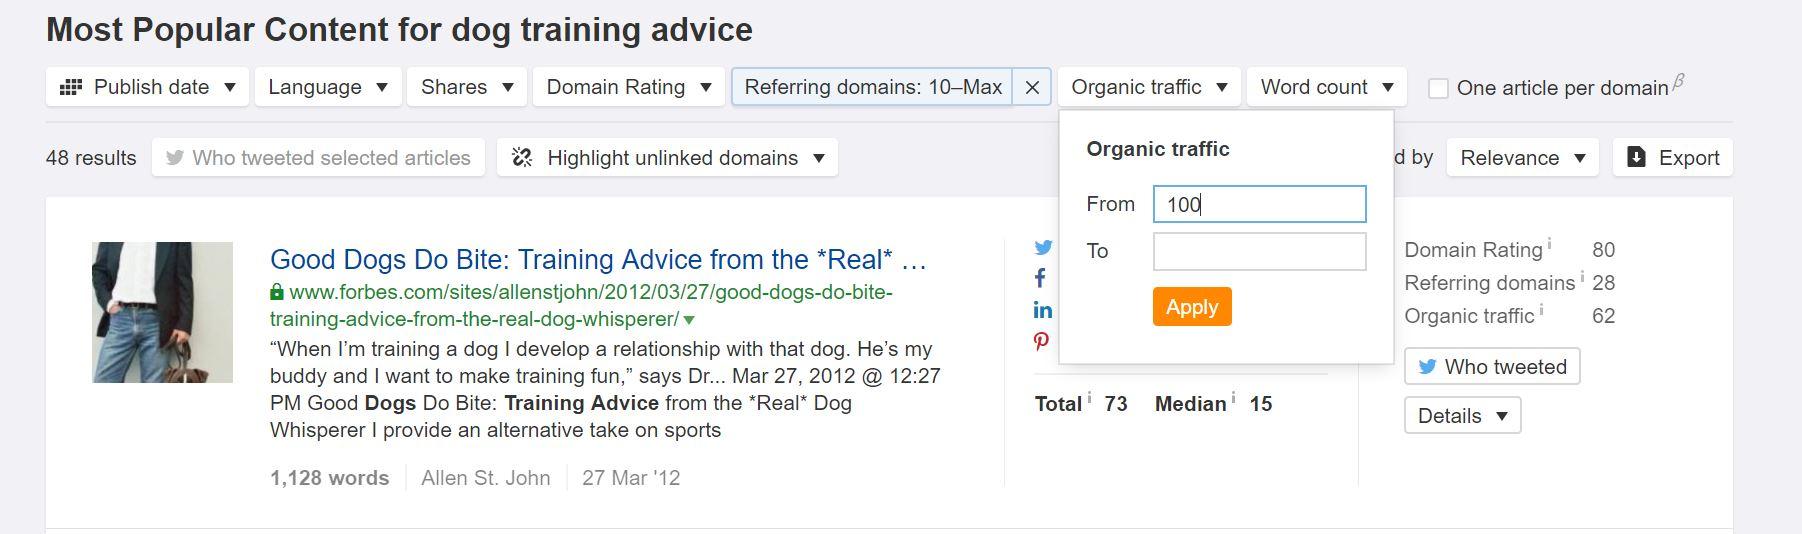 organic traffic refined content explorer search